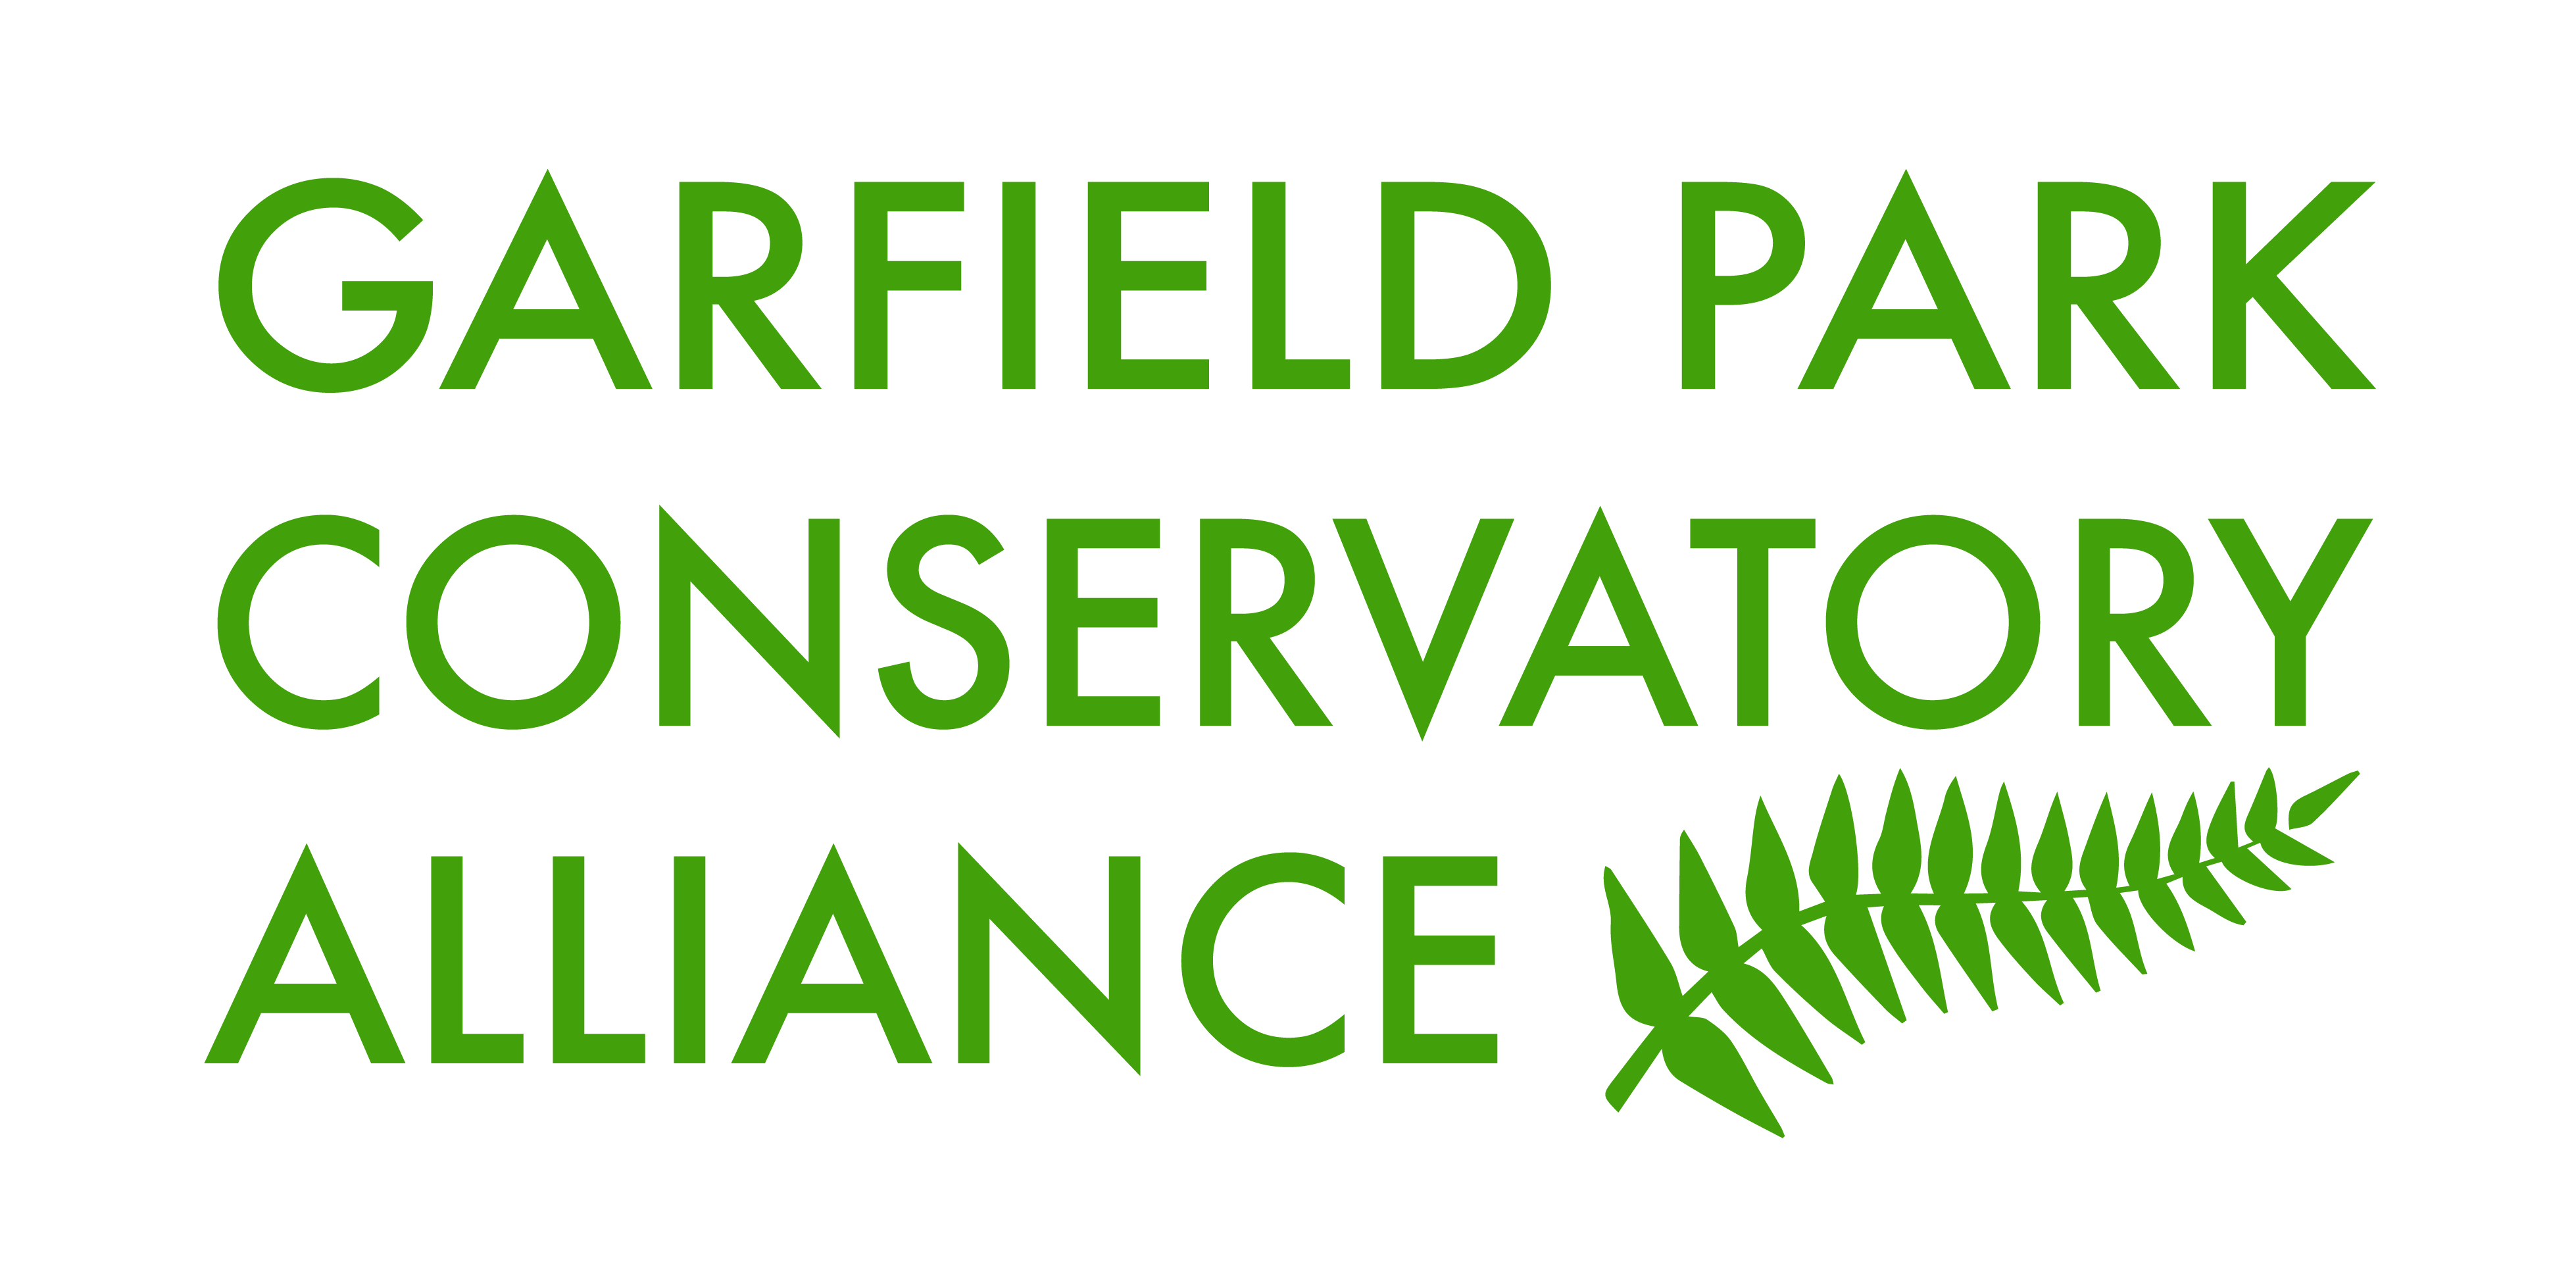 Garfield Park Conservatory Alliance